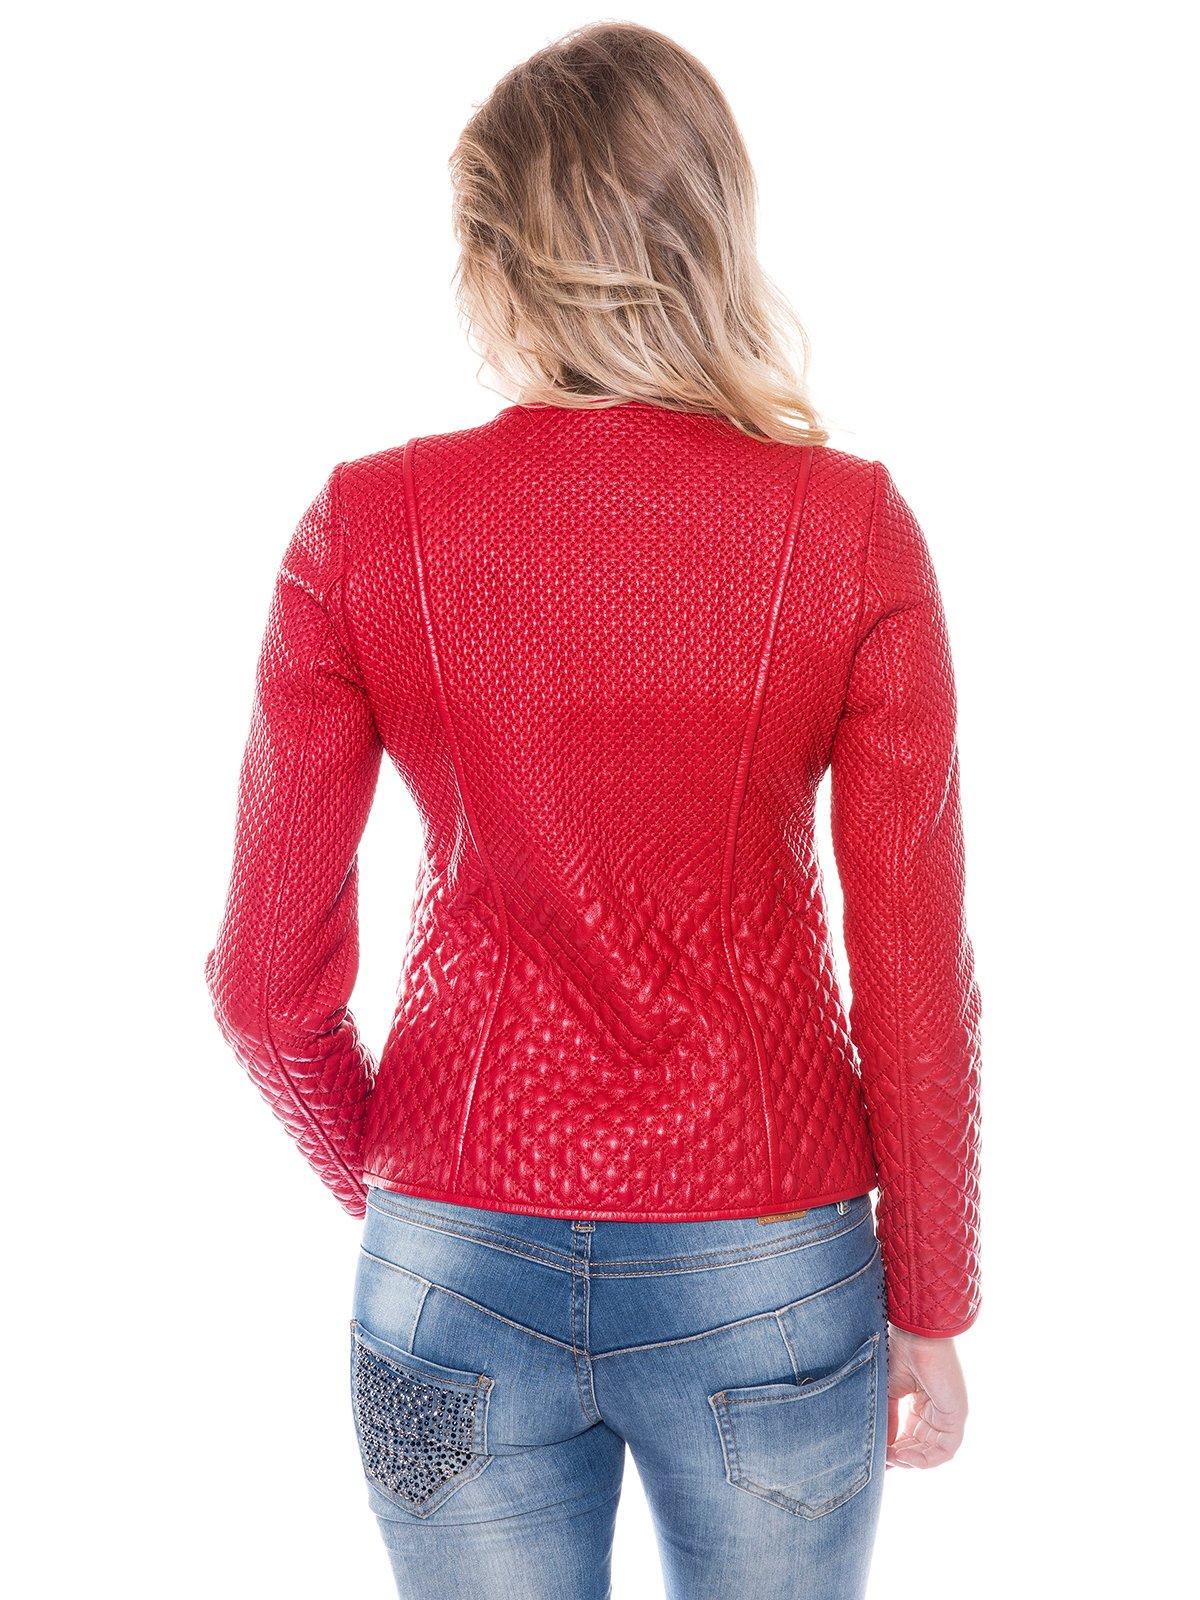 Куртка красная   2033764   фото 5